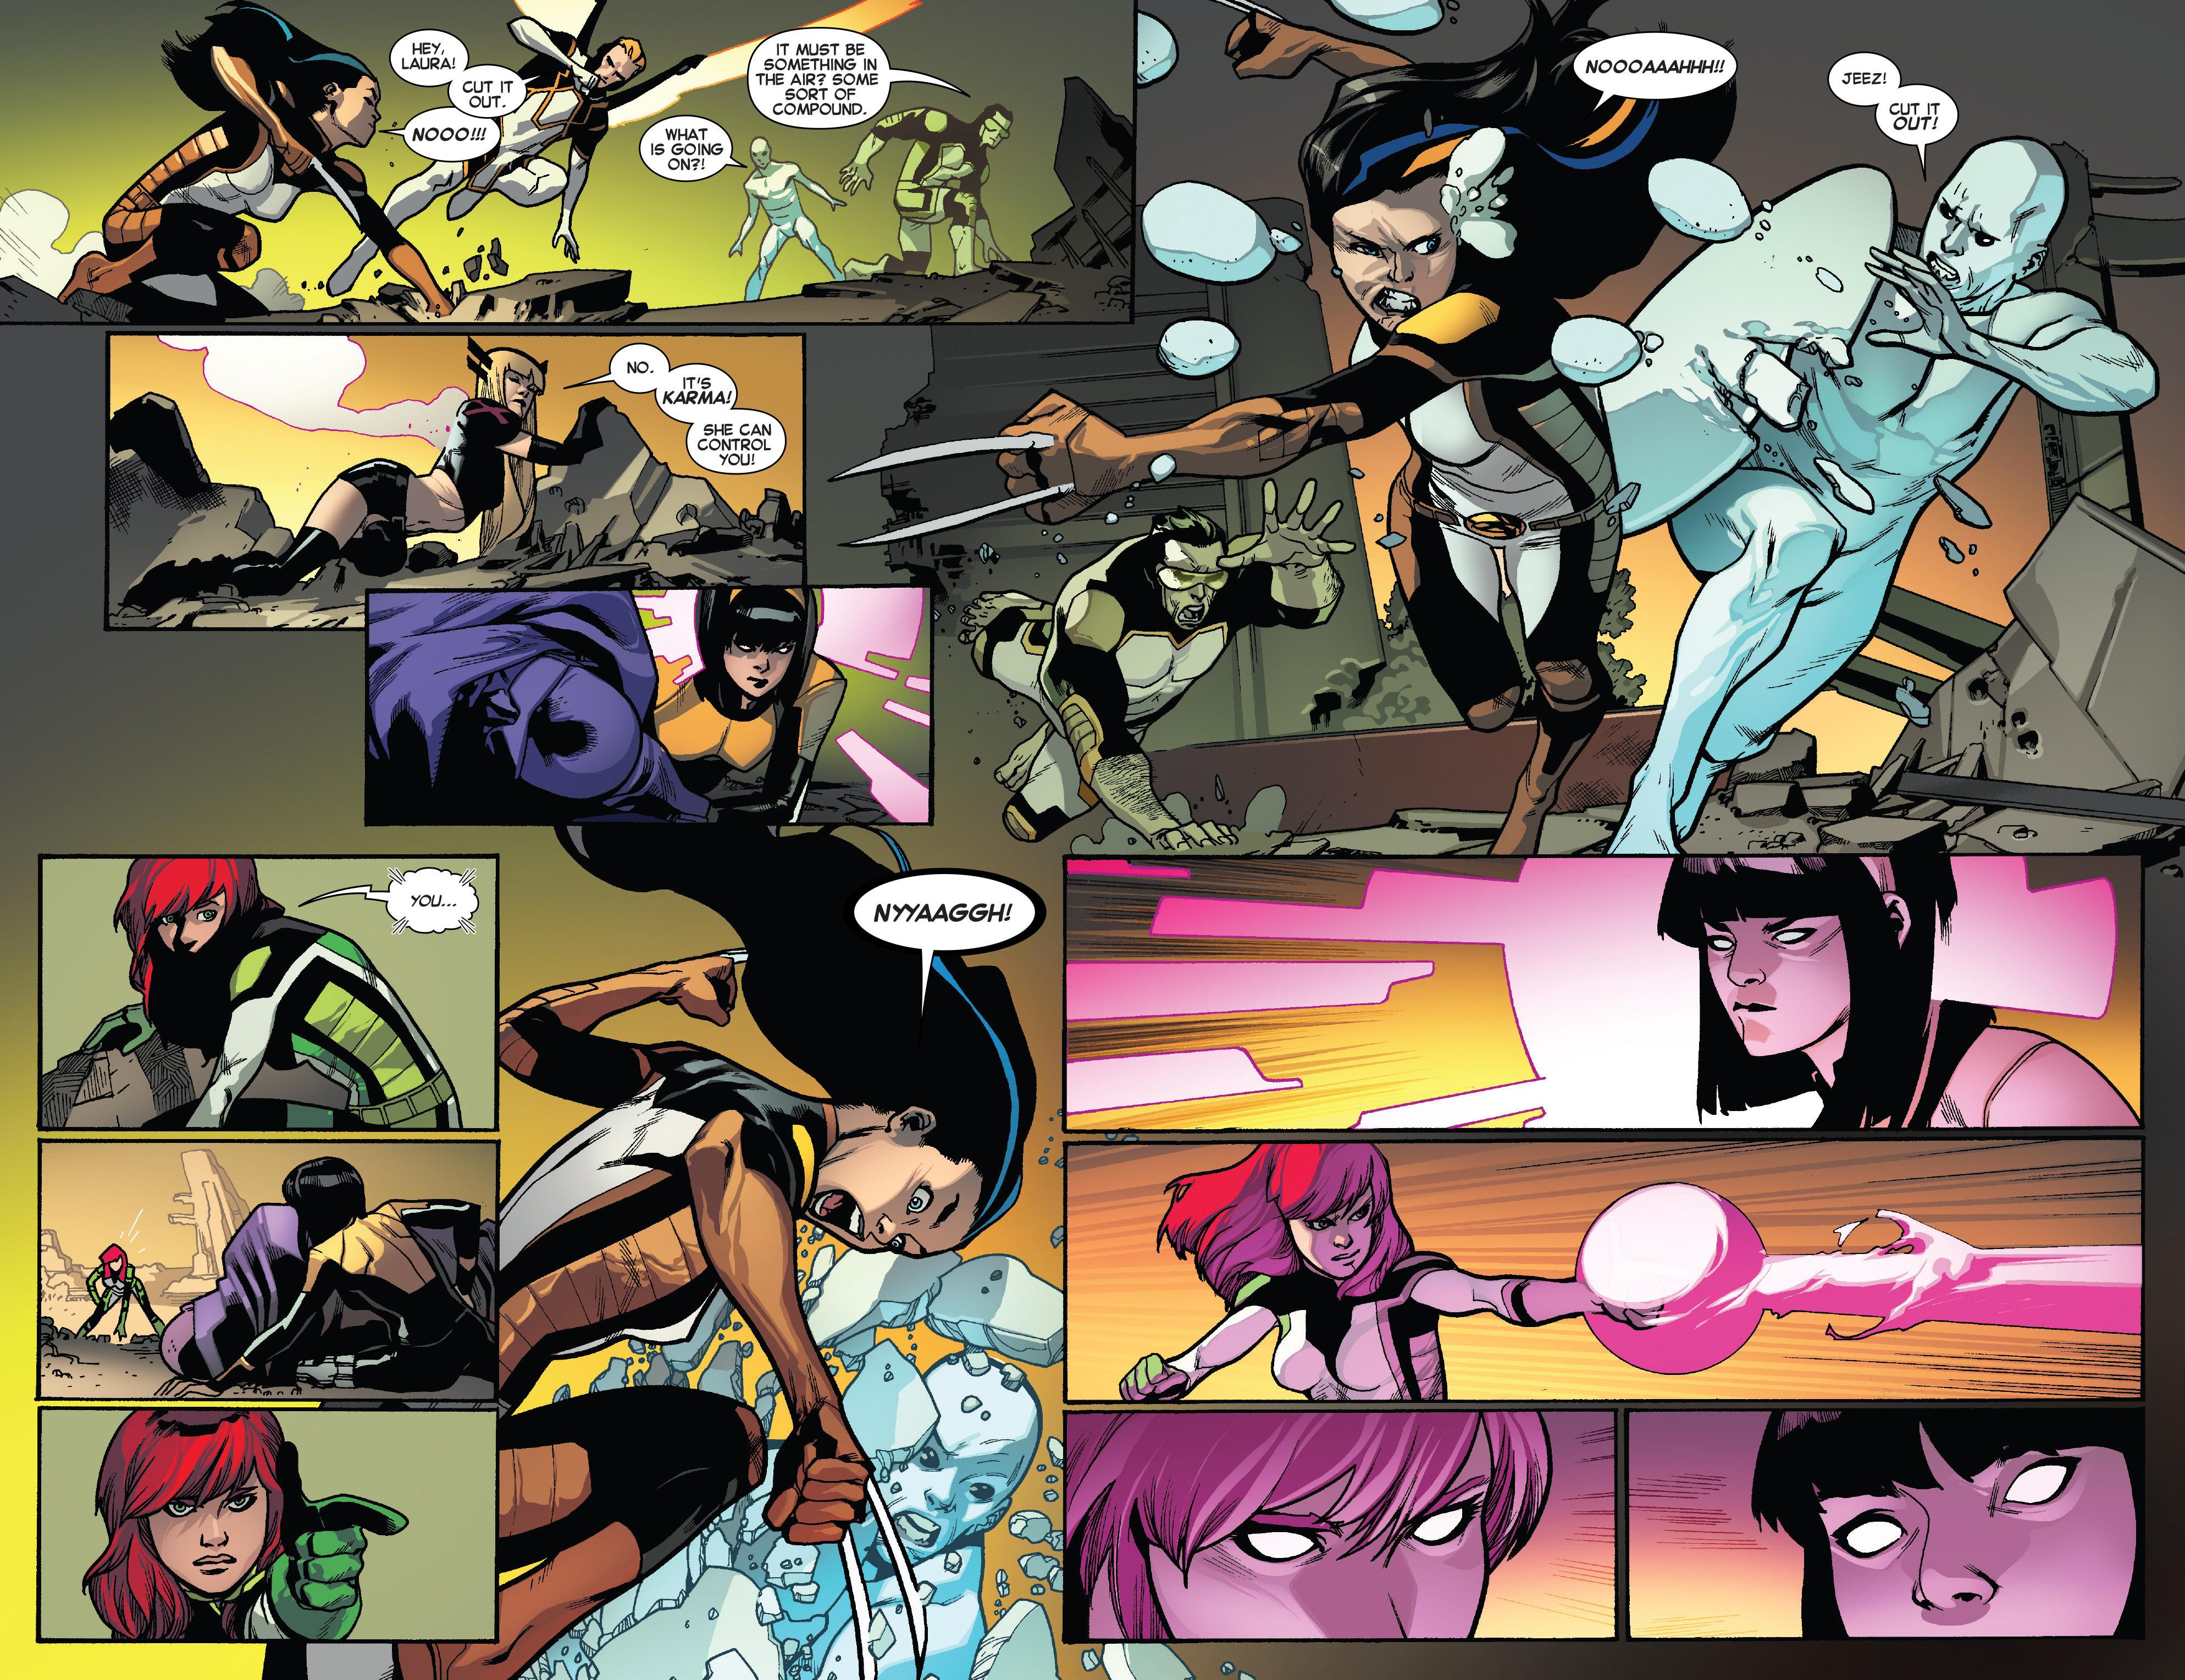 All-New X-Men (2013) chap 41 pic 12